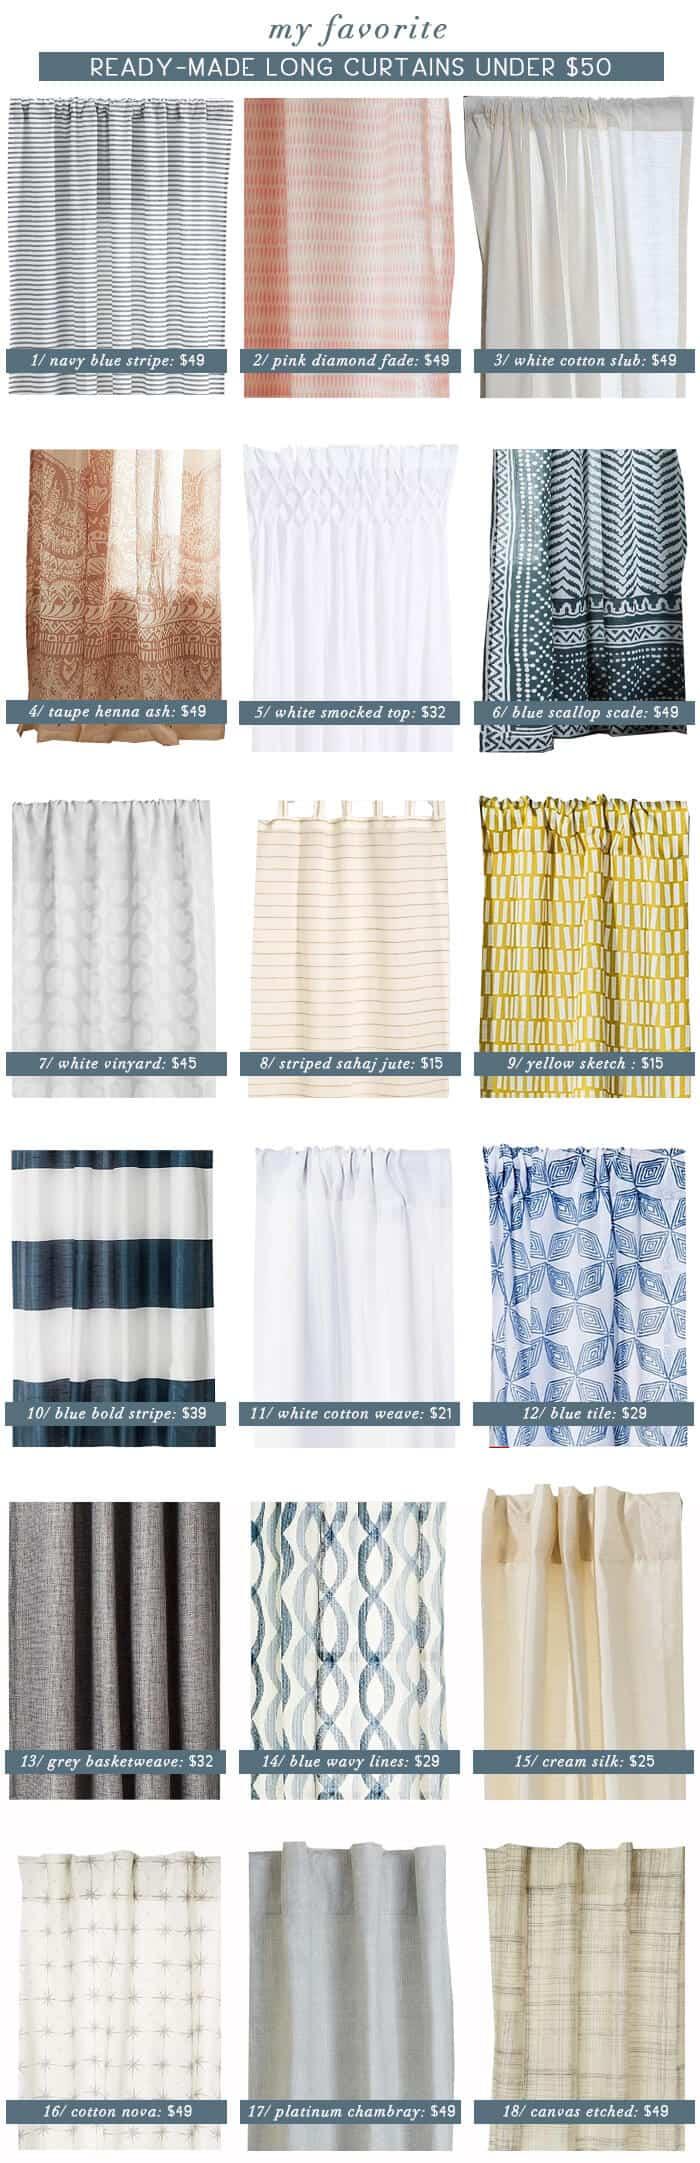 Emily Henderson_Best Curtain Panels Under 50_Roundup